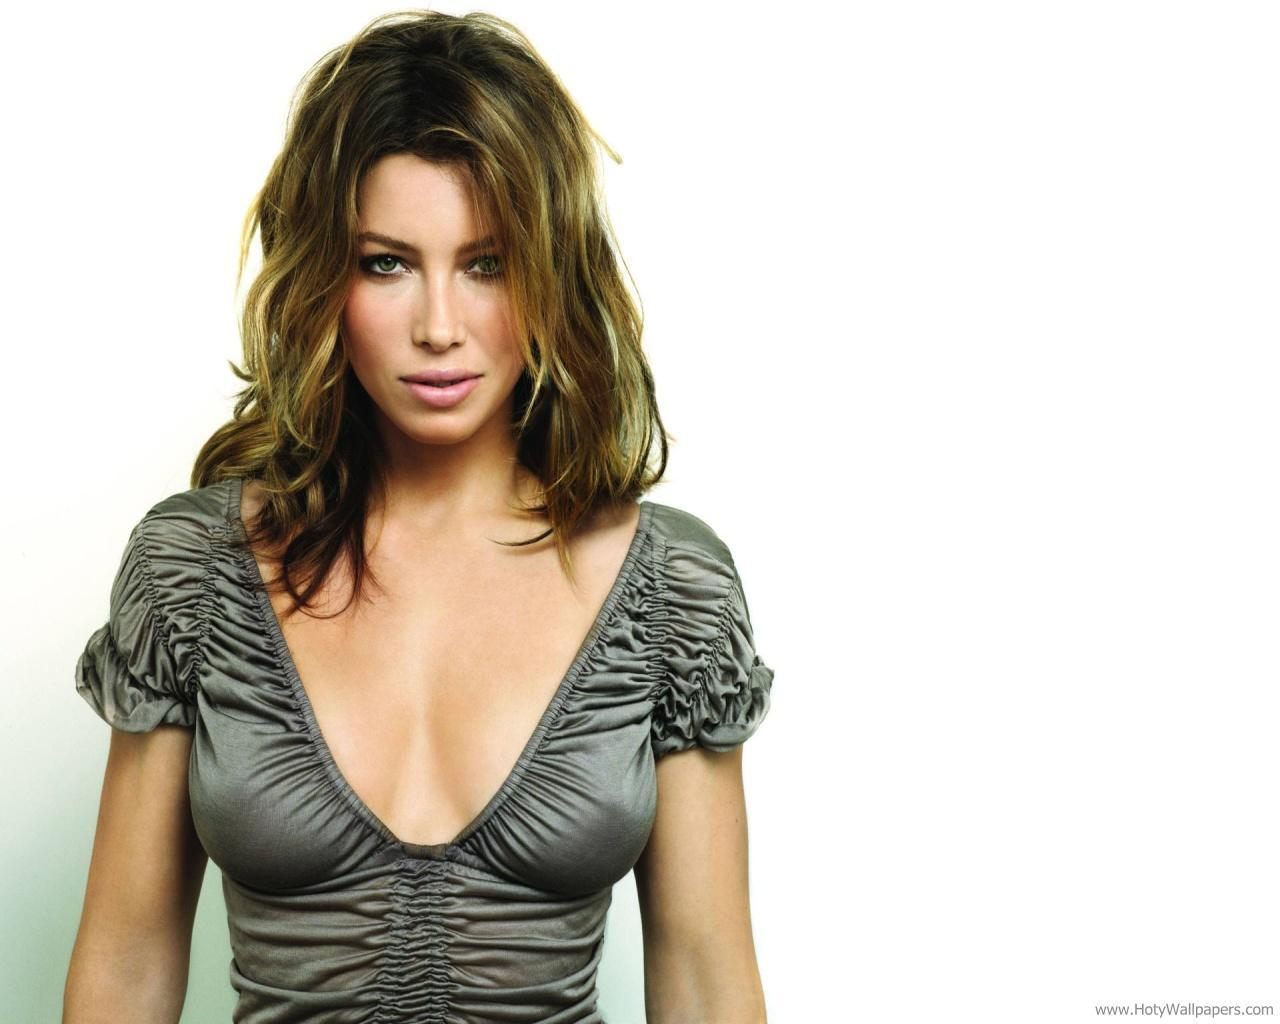 http://4.bp.blogspot.com/-jRyFF7nGl5M/ToWalA8AmtI/AAAAAAAALFI/LJPFb0ksxWI/s1600/jessica_biel_hollywood_actress_wallpaper.jpg